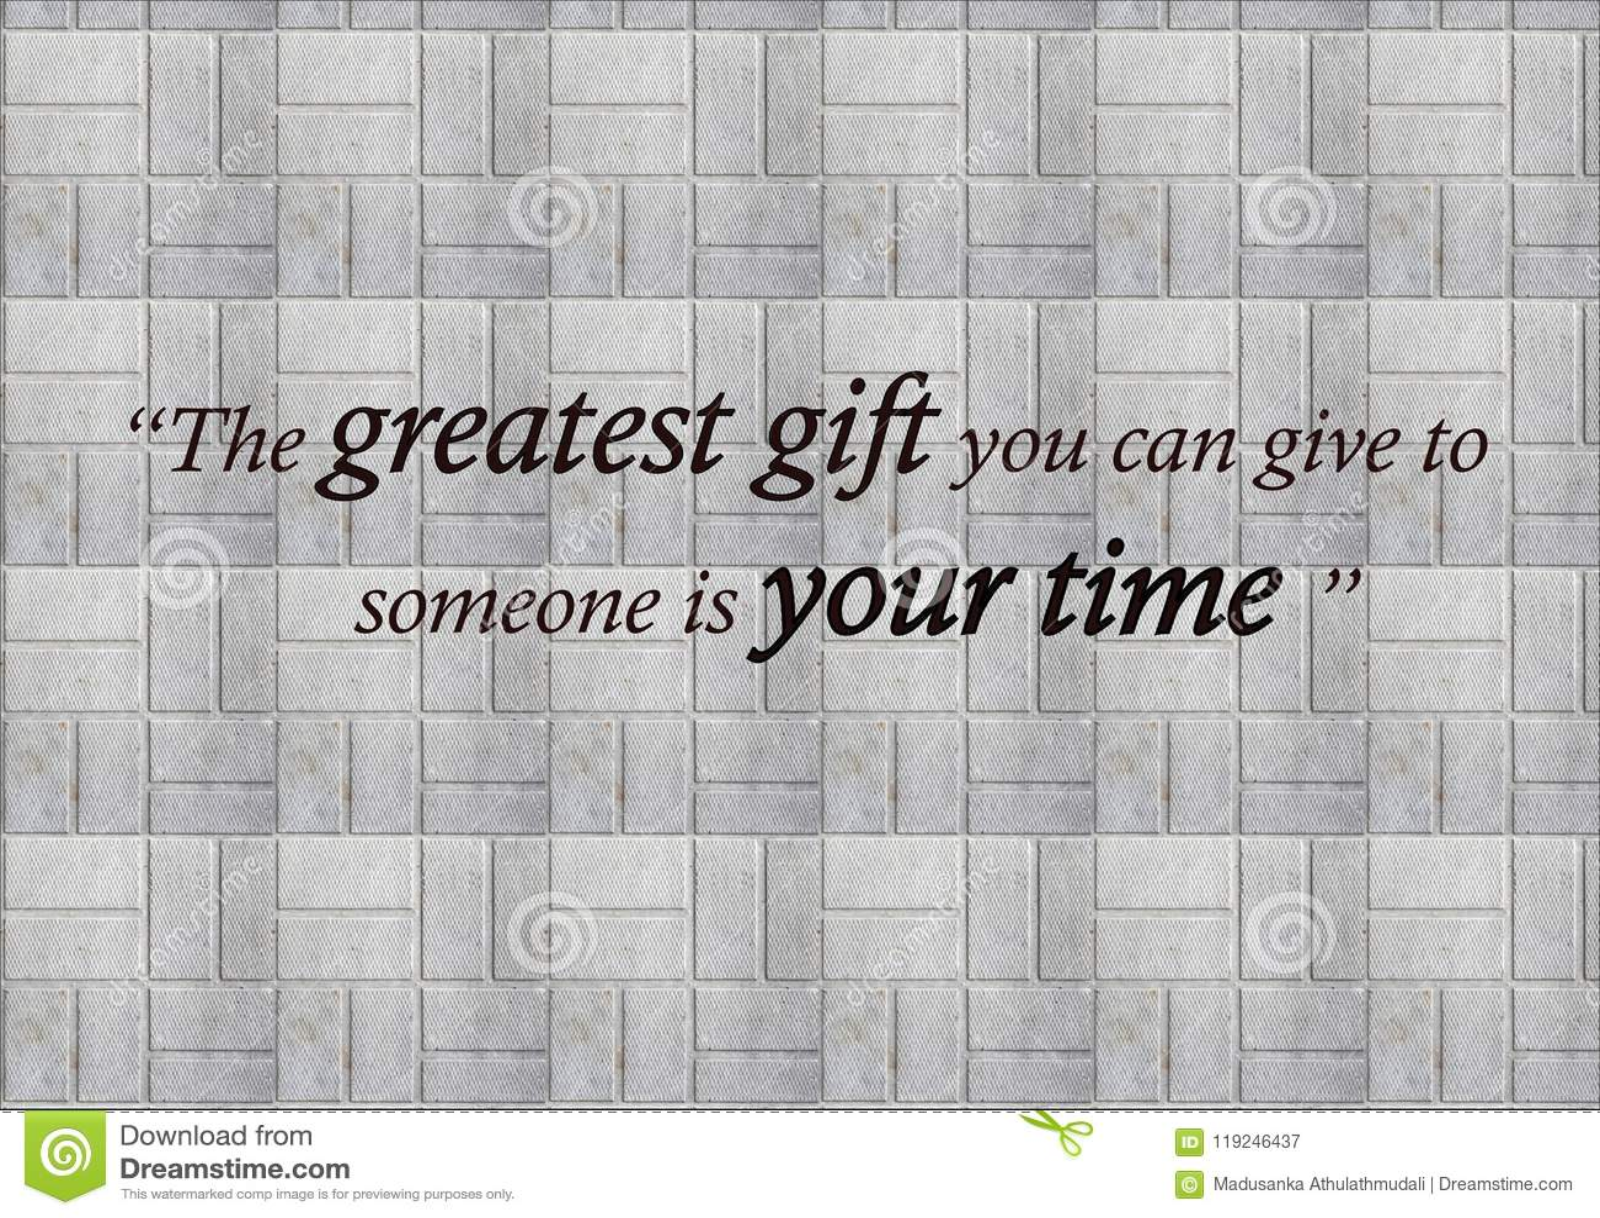 Conceptual, motivational & inspirational quotes & ideas